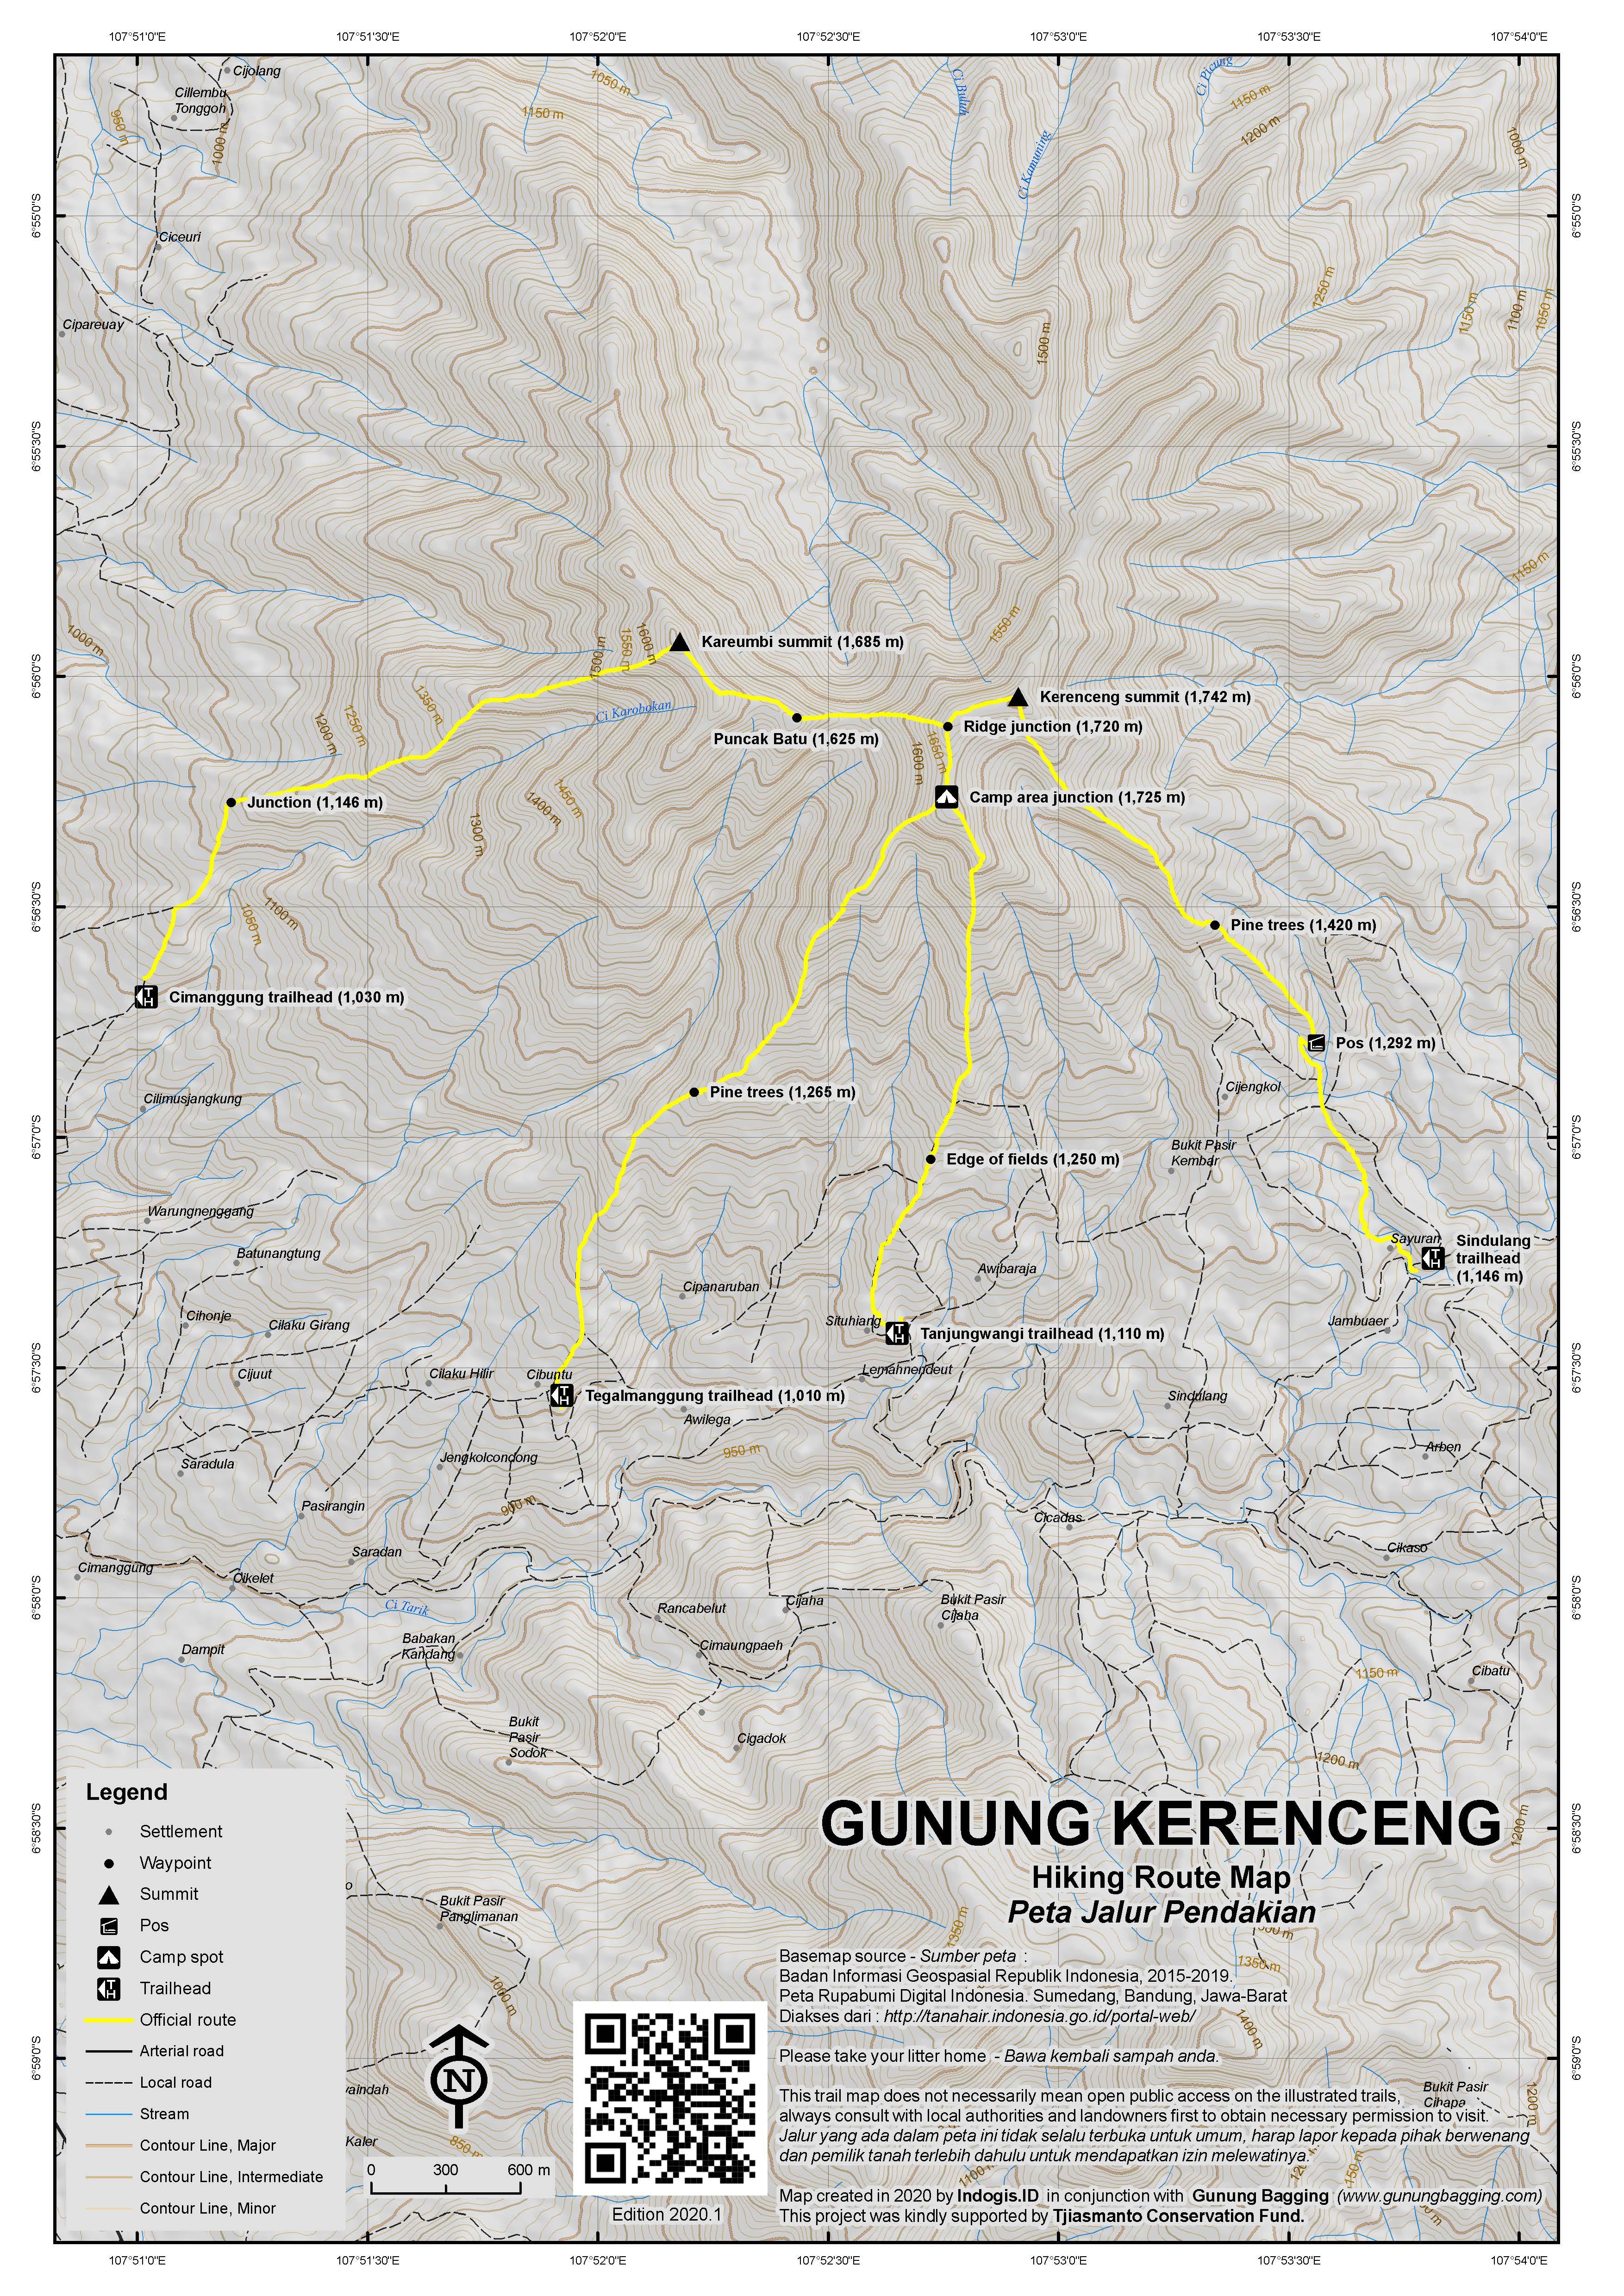 Peta Jalur Pendakian Gunung Kerenceng